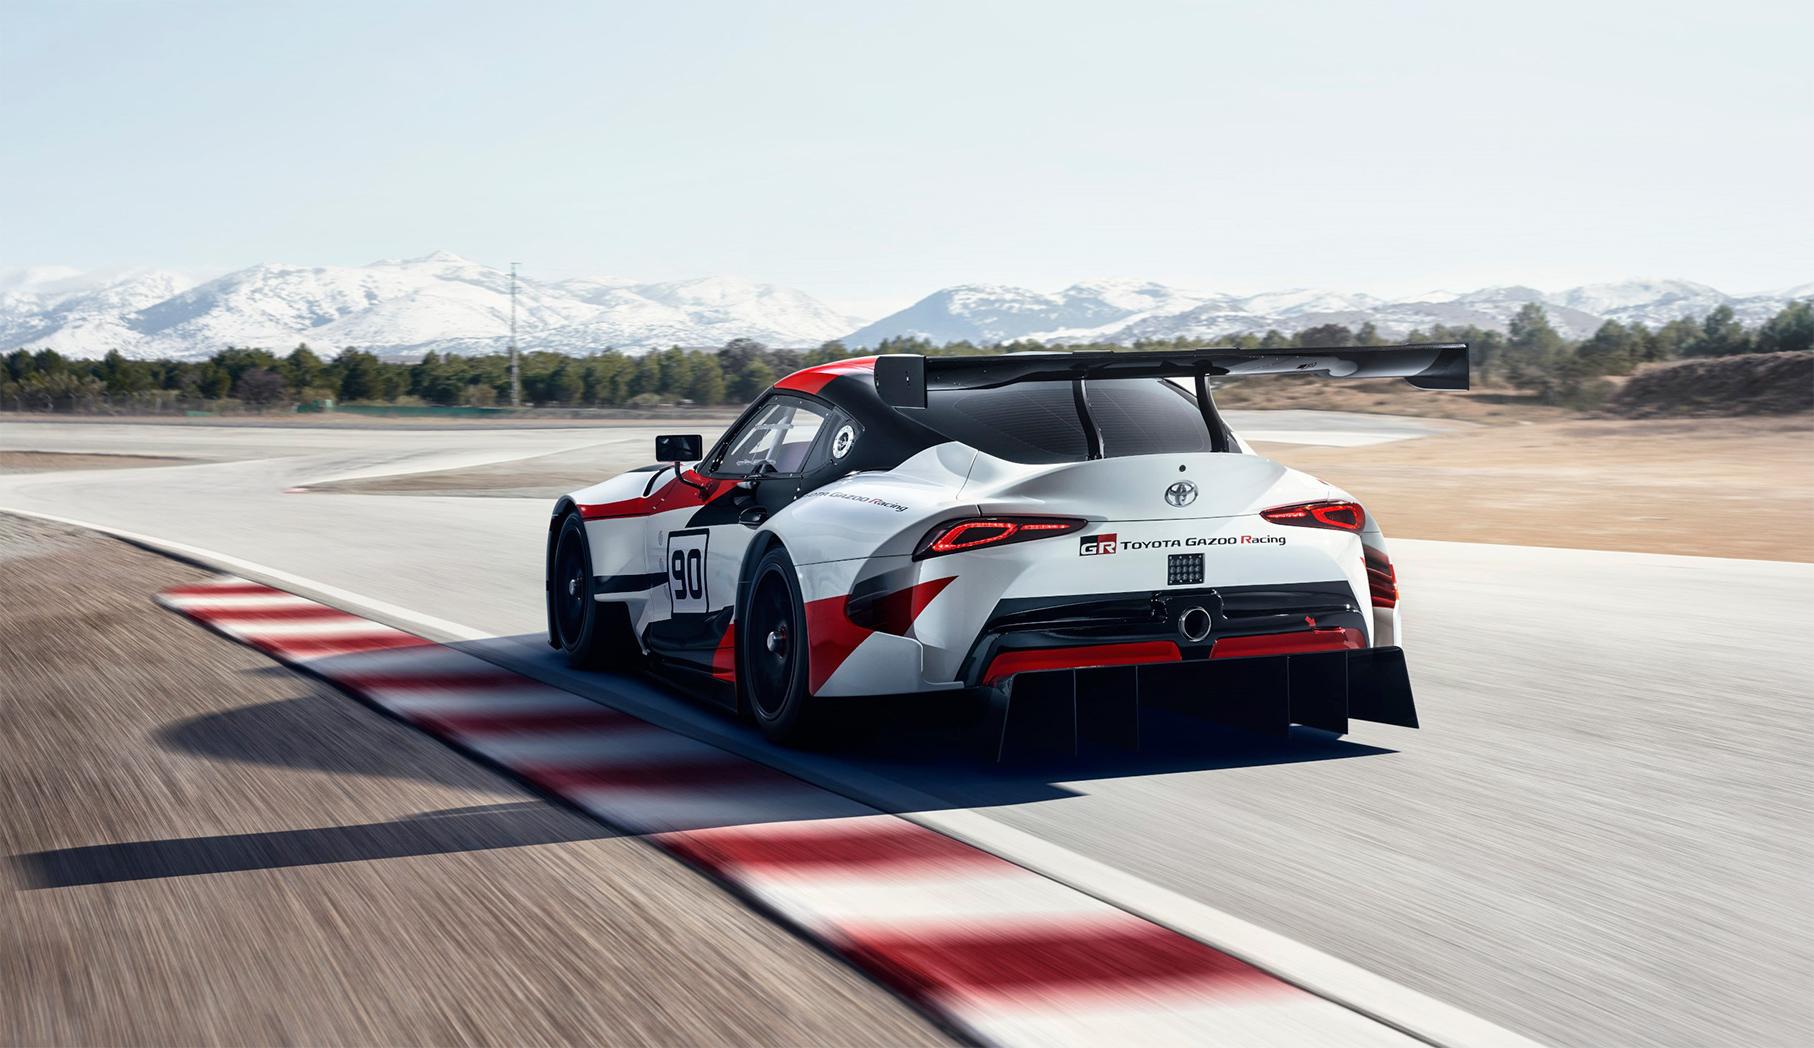 TrackWorthy - TOYOTA GAZOO Racing GR Supra Racing Concept (2)